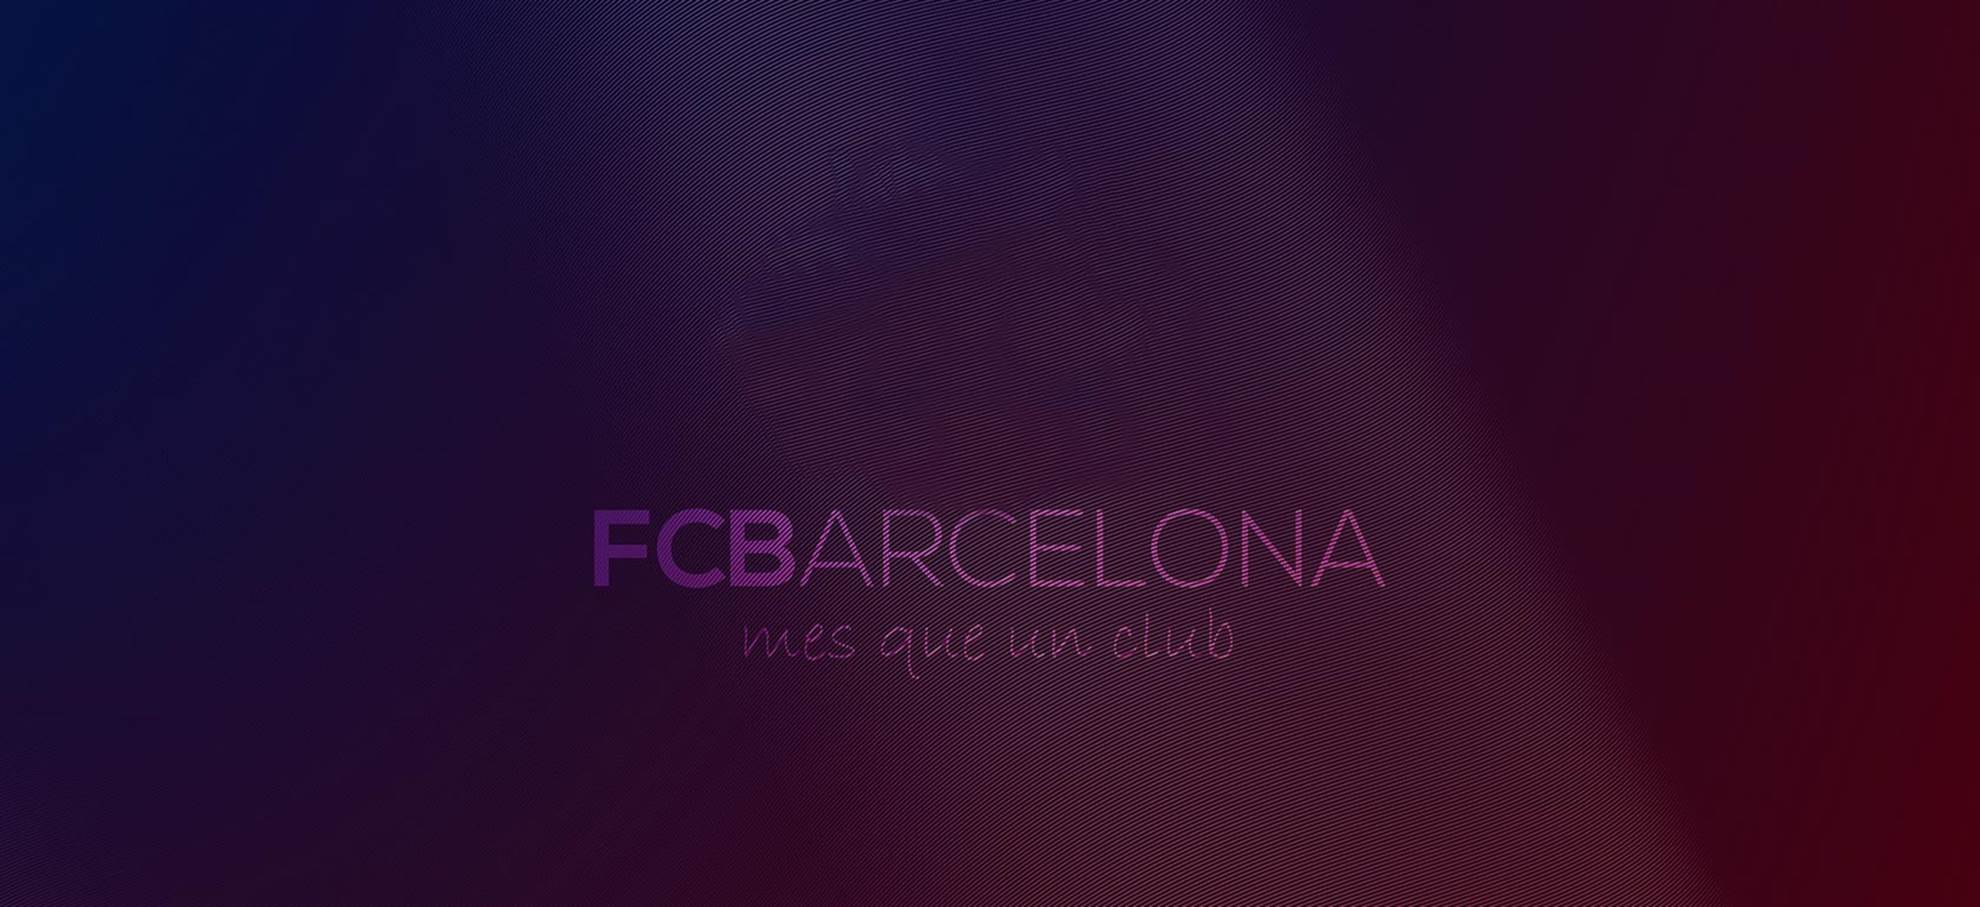 FC Barcelona - Real Betis (25-08-2019)